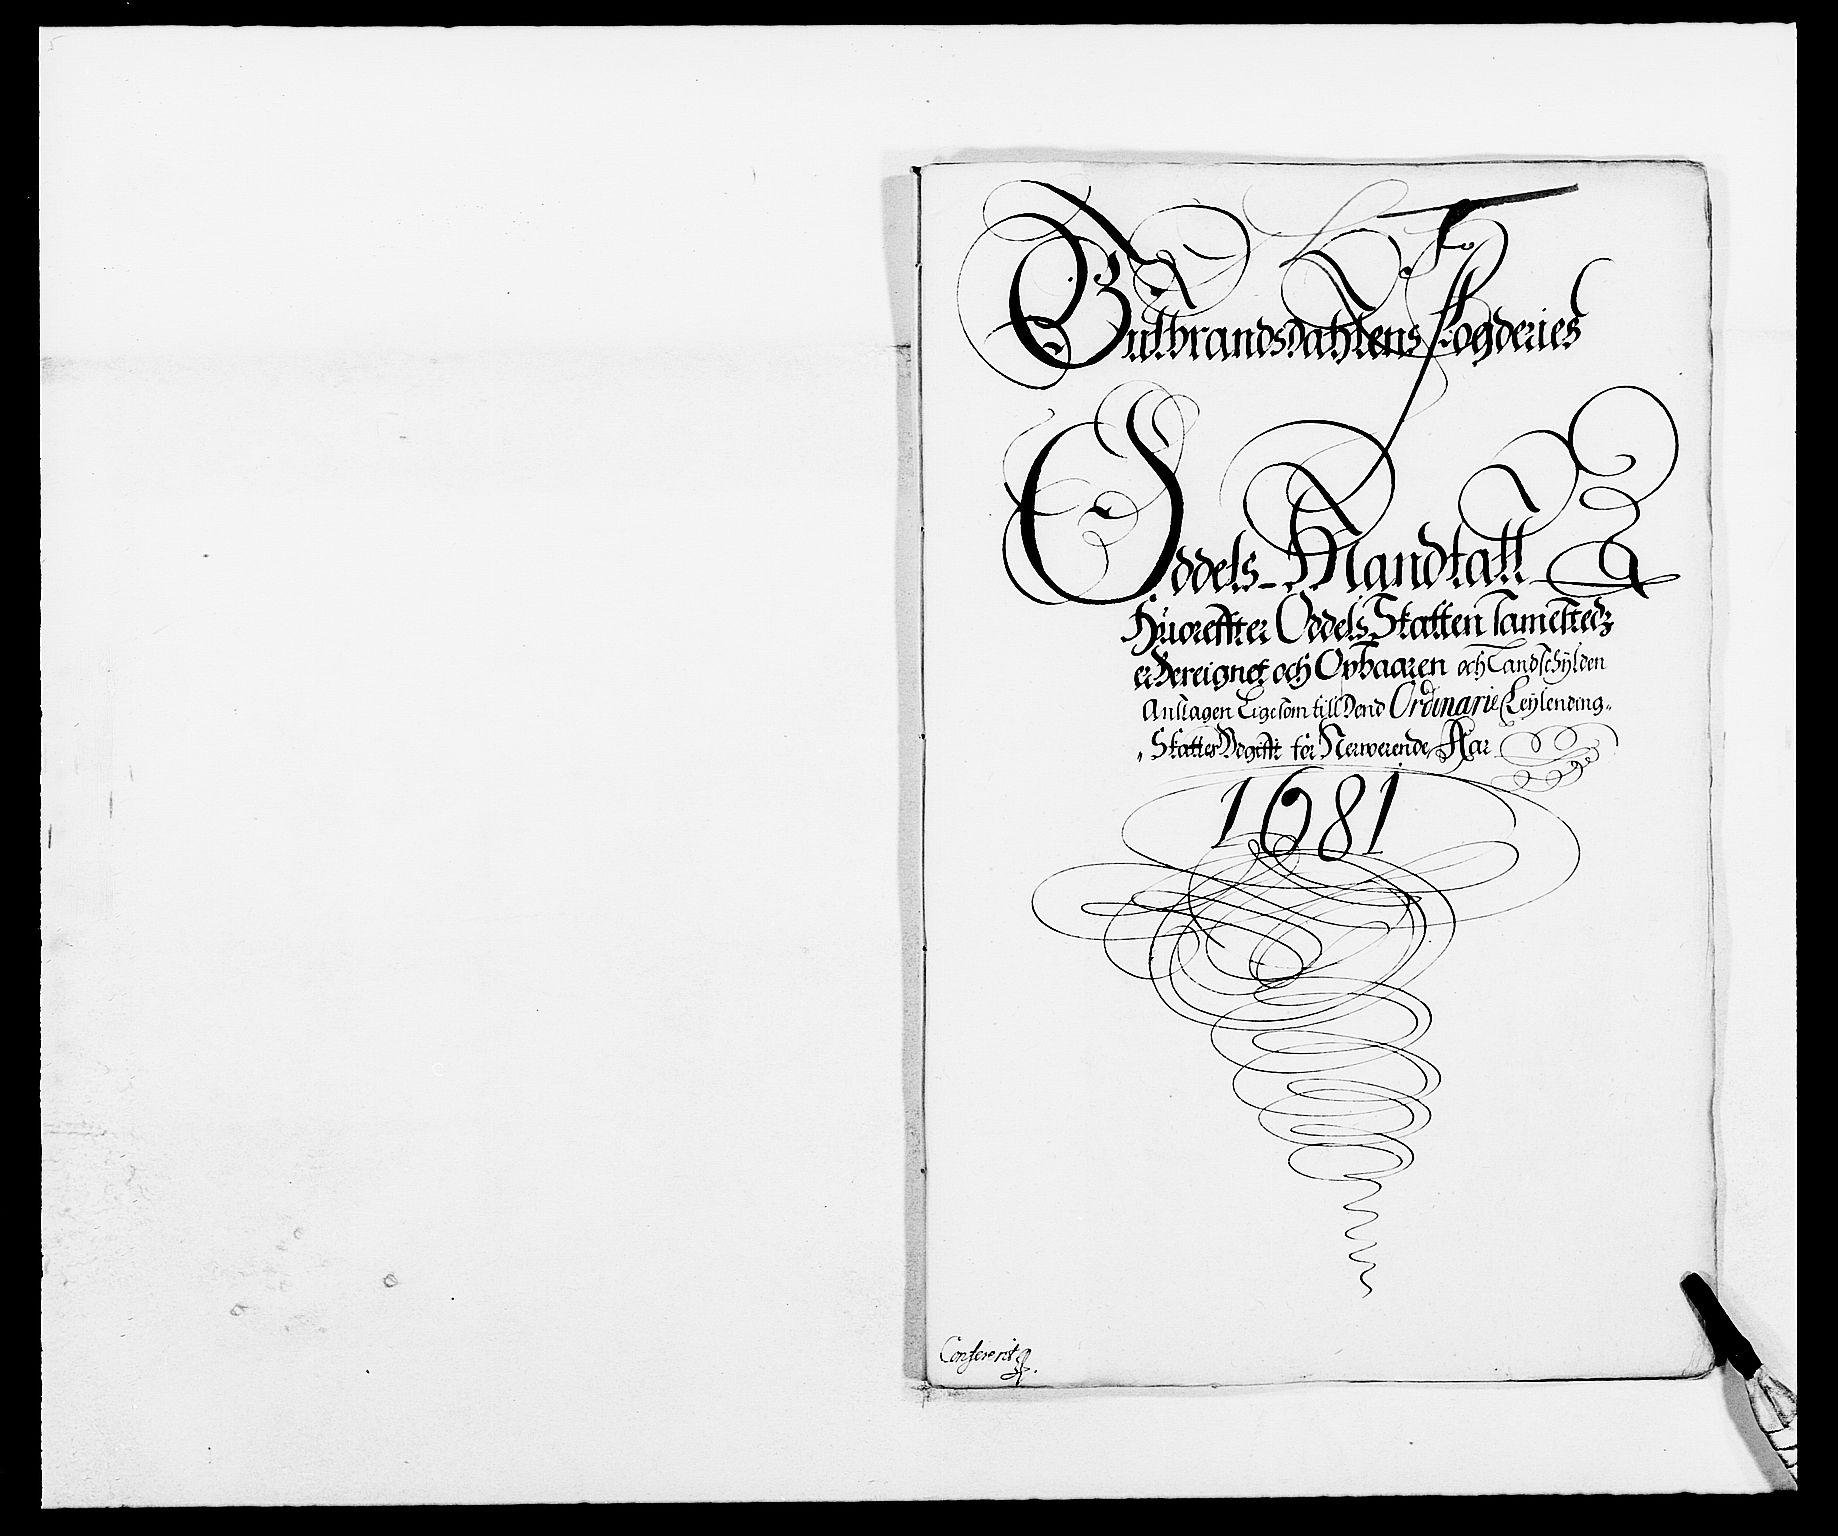 RA, Rentekammeret inntil 1814, Reviderte regnskaper, Fogderegnskap, R17/L1156: Fogderegnskap Gudbrandsdal, 1681, s. 73